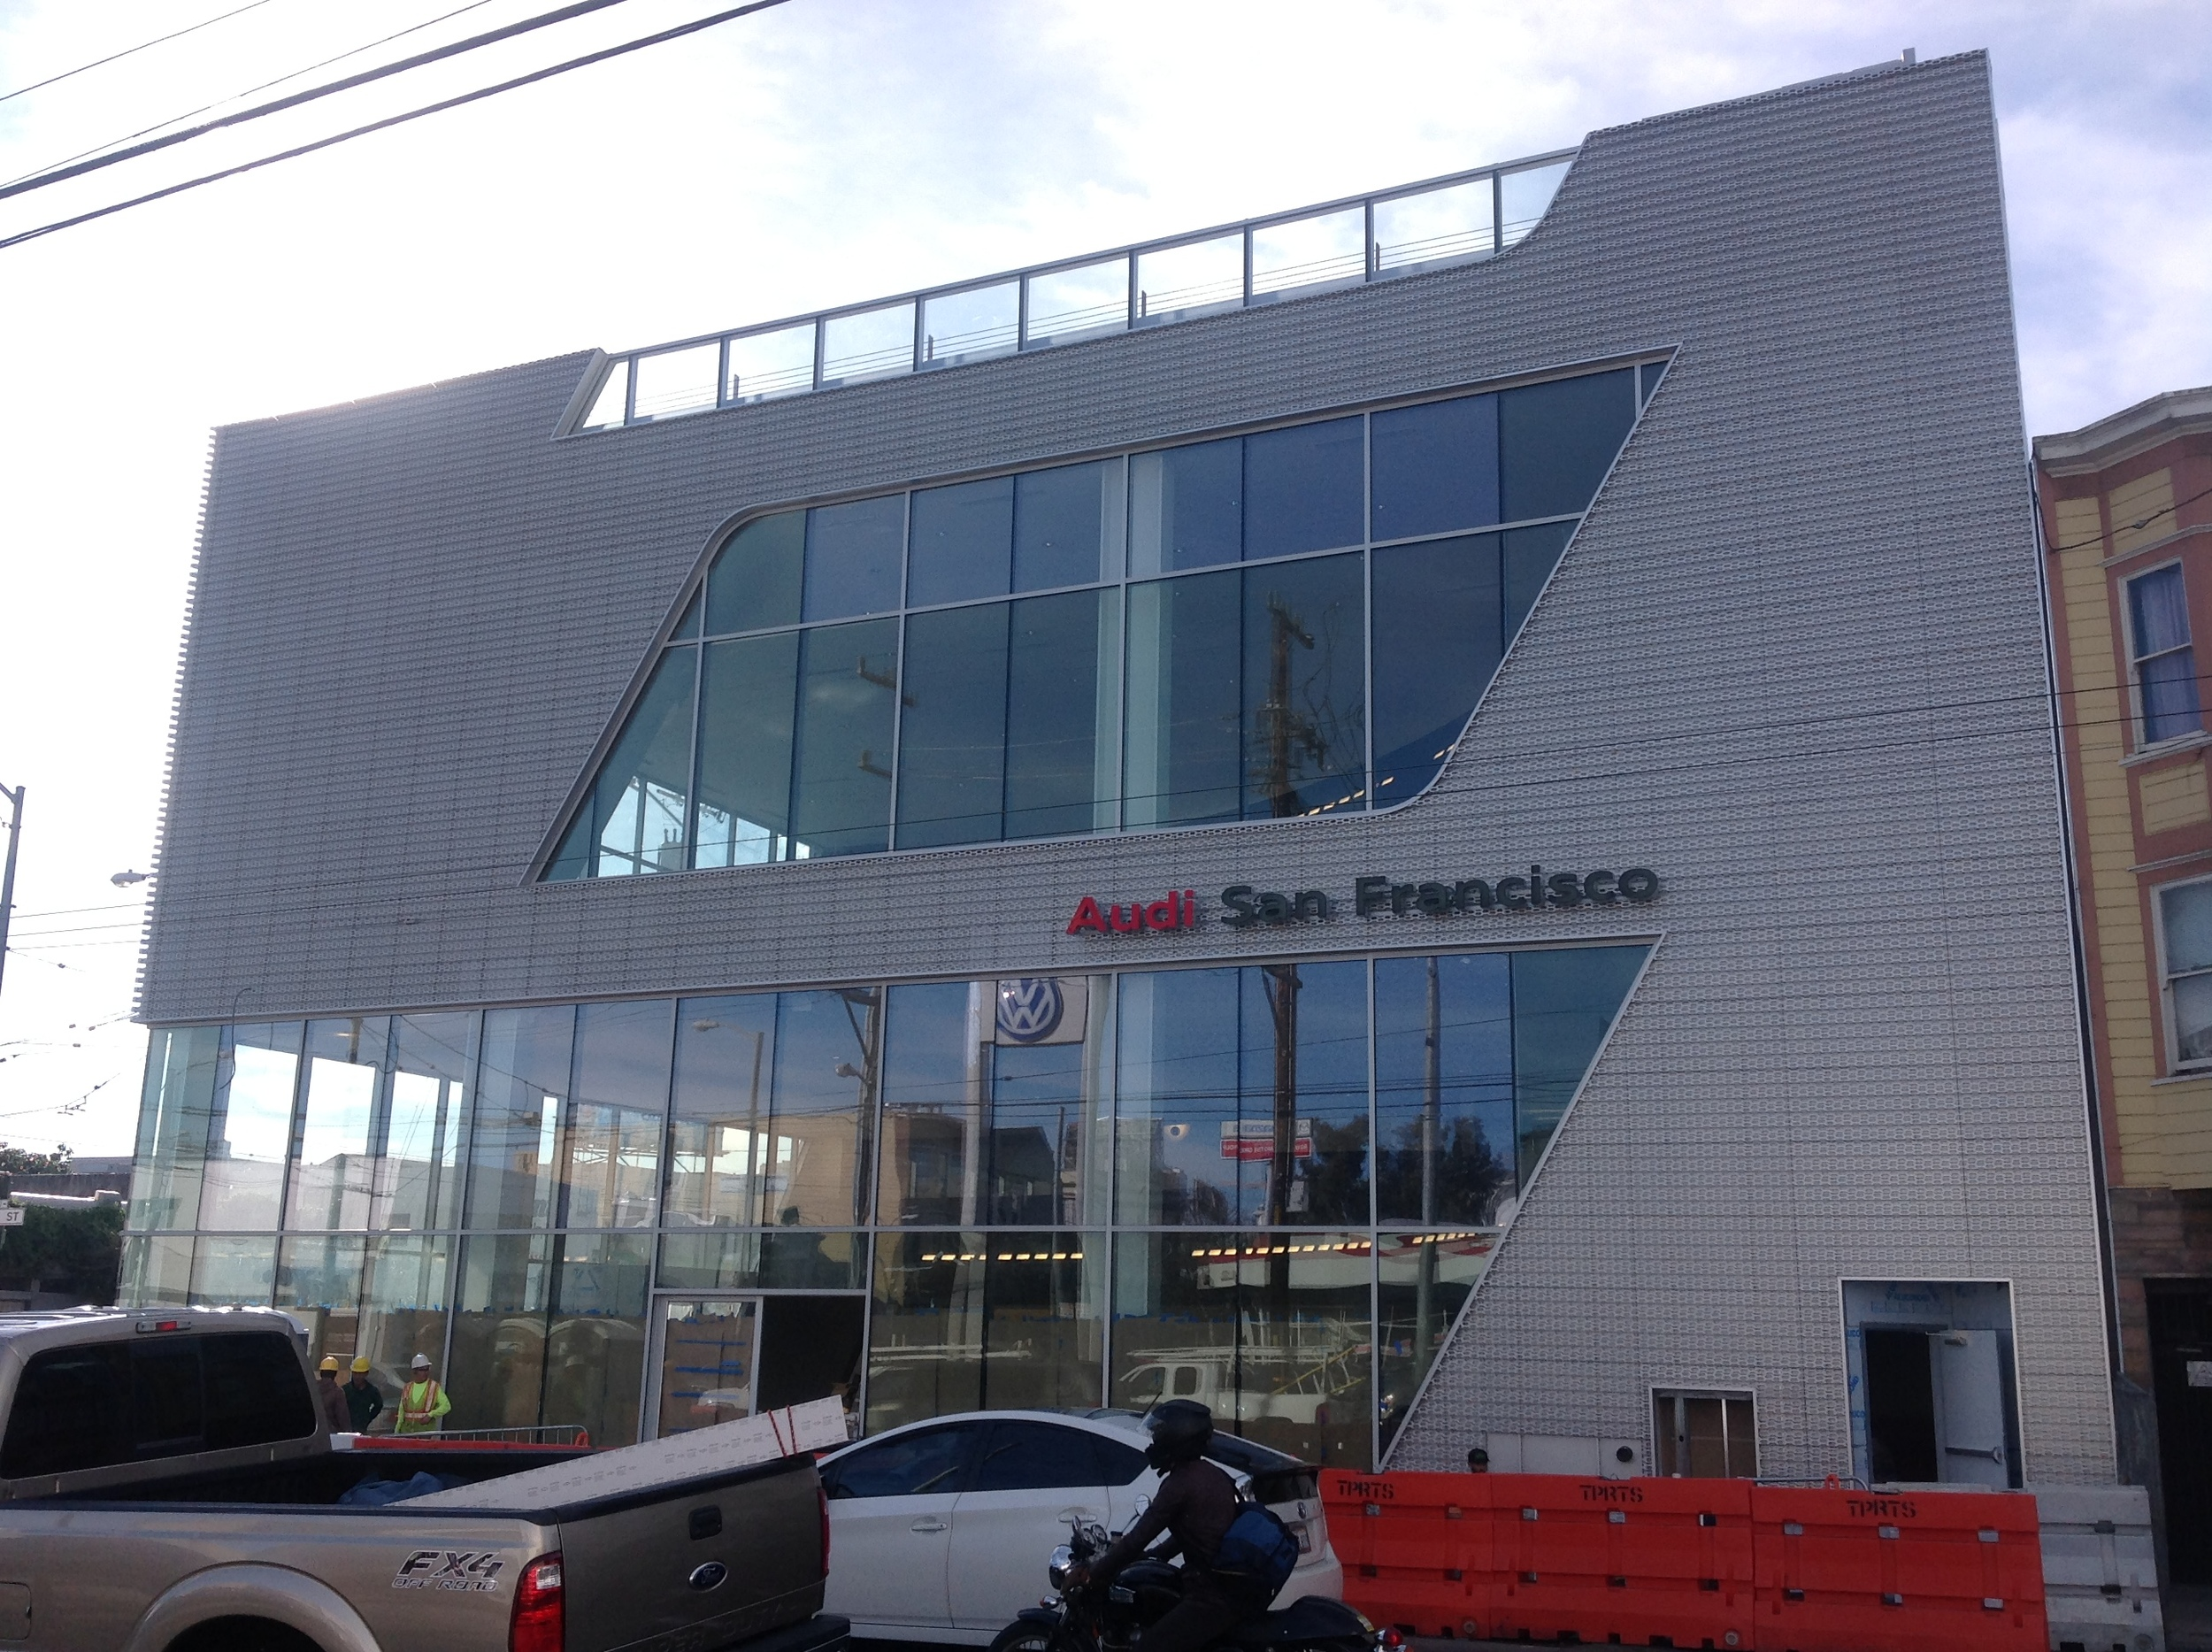 Audi San Francisco >> Audi San Francisco San Francisco Ca Rua And Son Mechanical